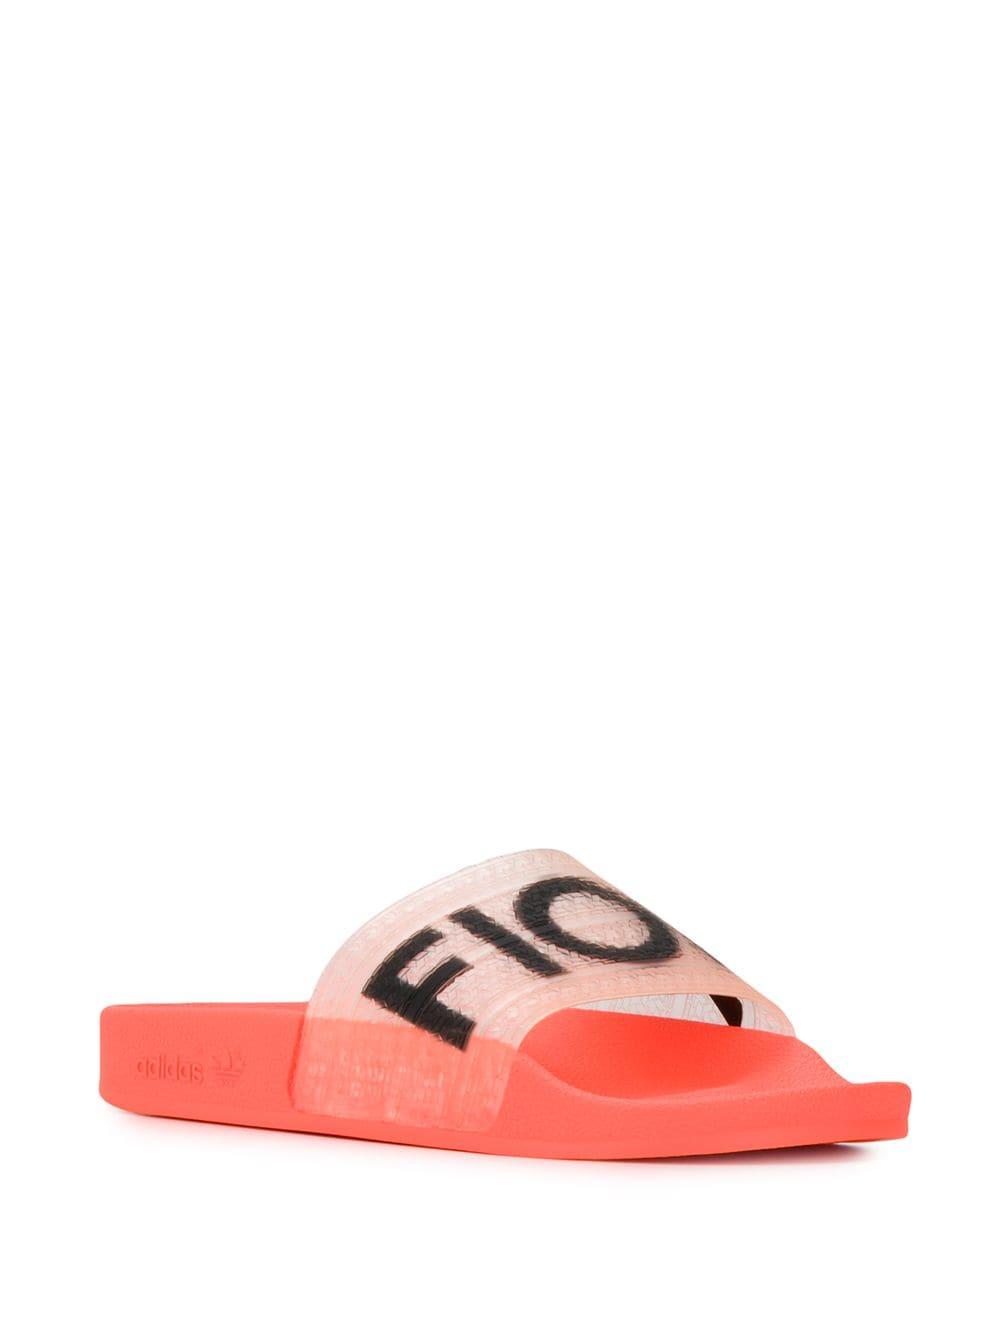 adidas Fiorucci slide sandals - ORANGE